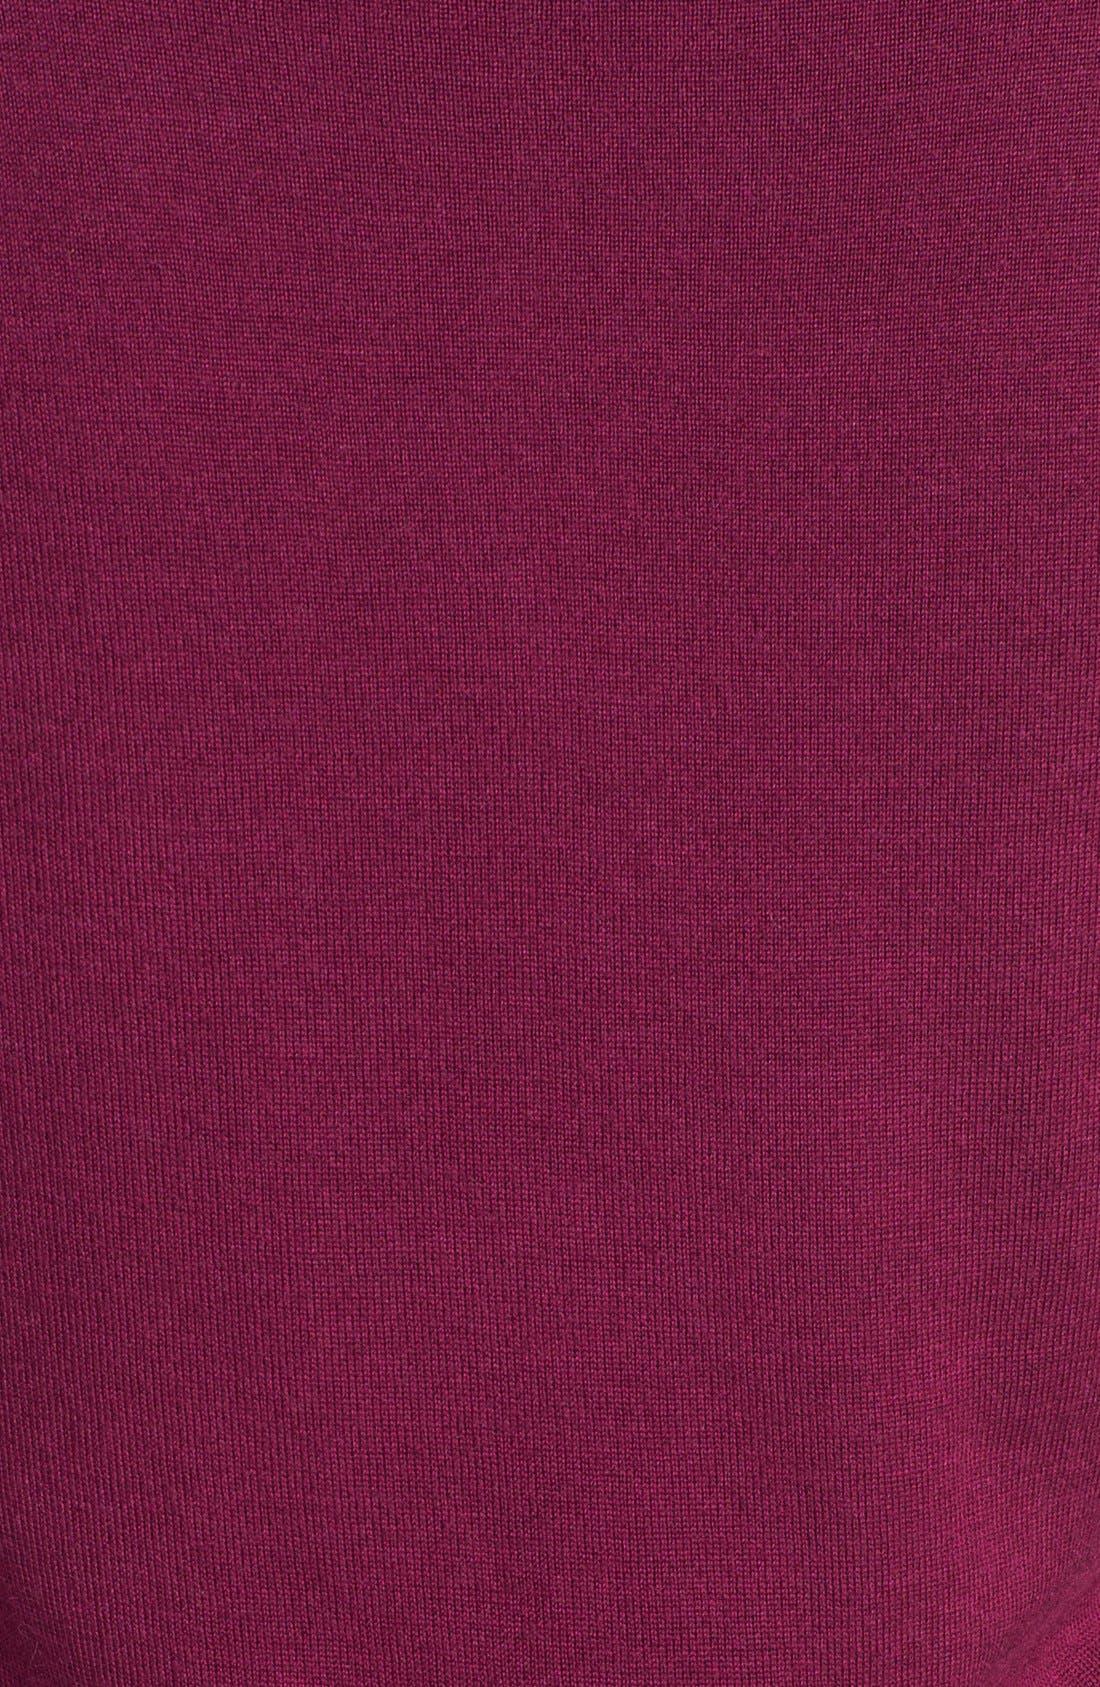 Alternate Image 3  - Halogen® Three Quarter Sleeve Crewneck Sweater